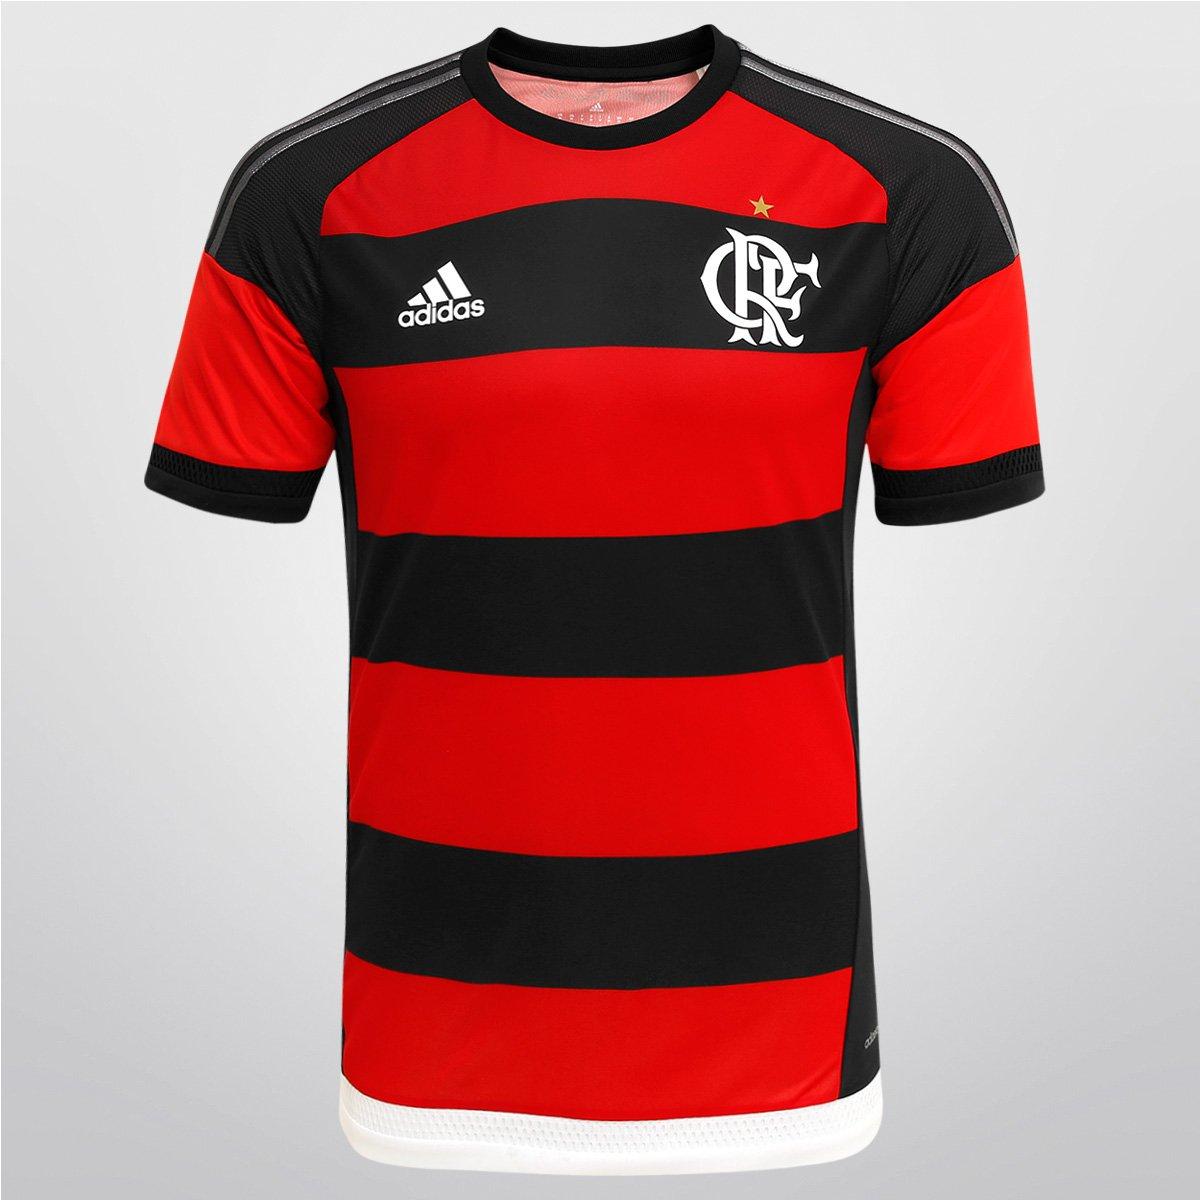 f645c8d234 Camisa Adidas Flamengo I 15 16 s nº - Jogador - Compre Agora